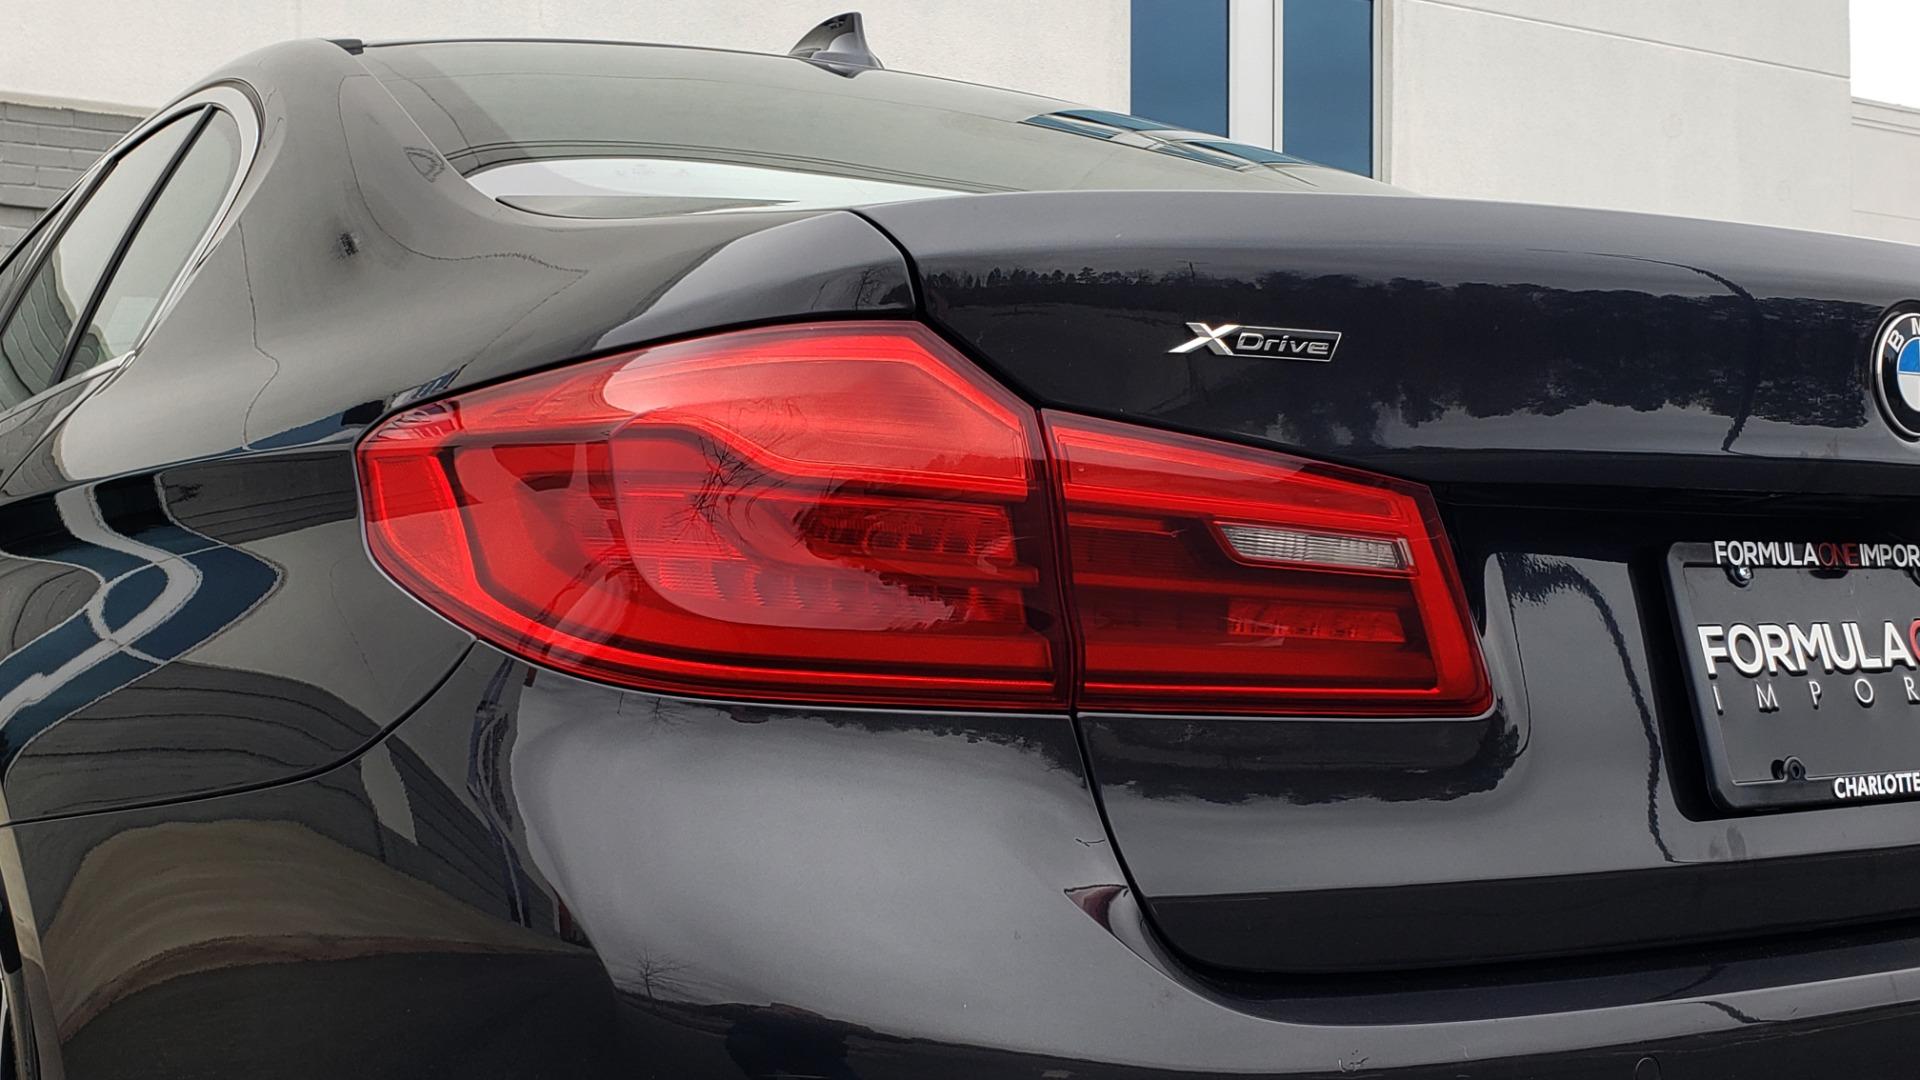 Used 2017 BMW 5 SERIES 530IXDRIVE / PREM PKG / DRVR ASST PLUS / CLD WTHR / APPLE CARPLAY for sale $30,595 at Formula Imports in Charlotte NC 28227 26